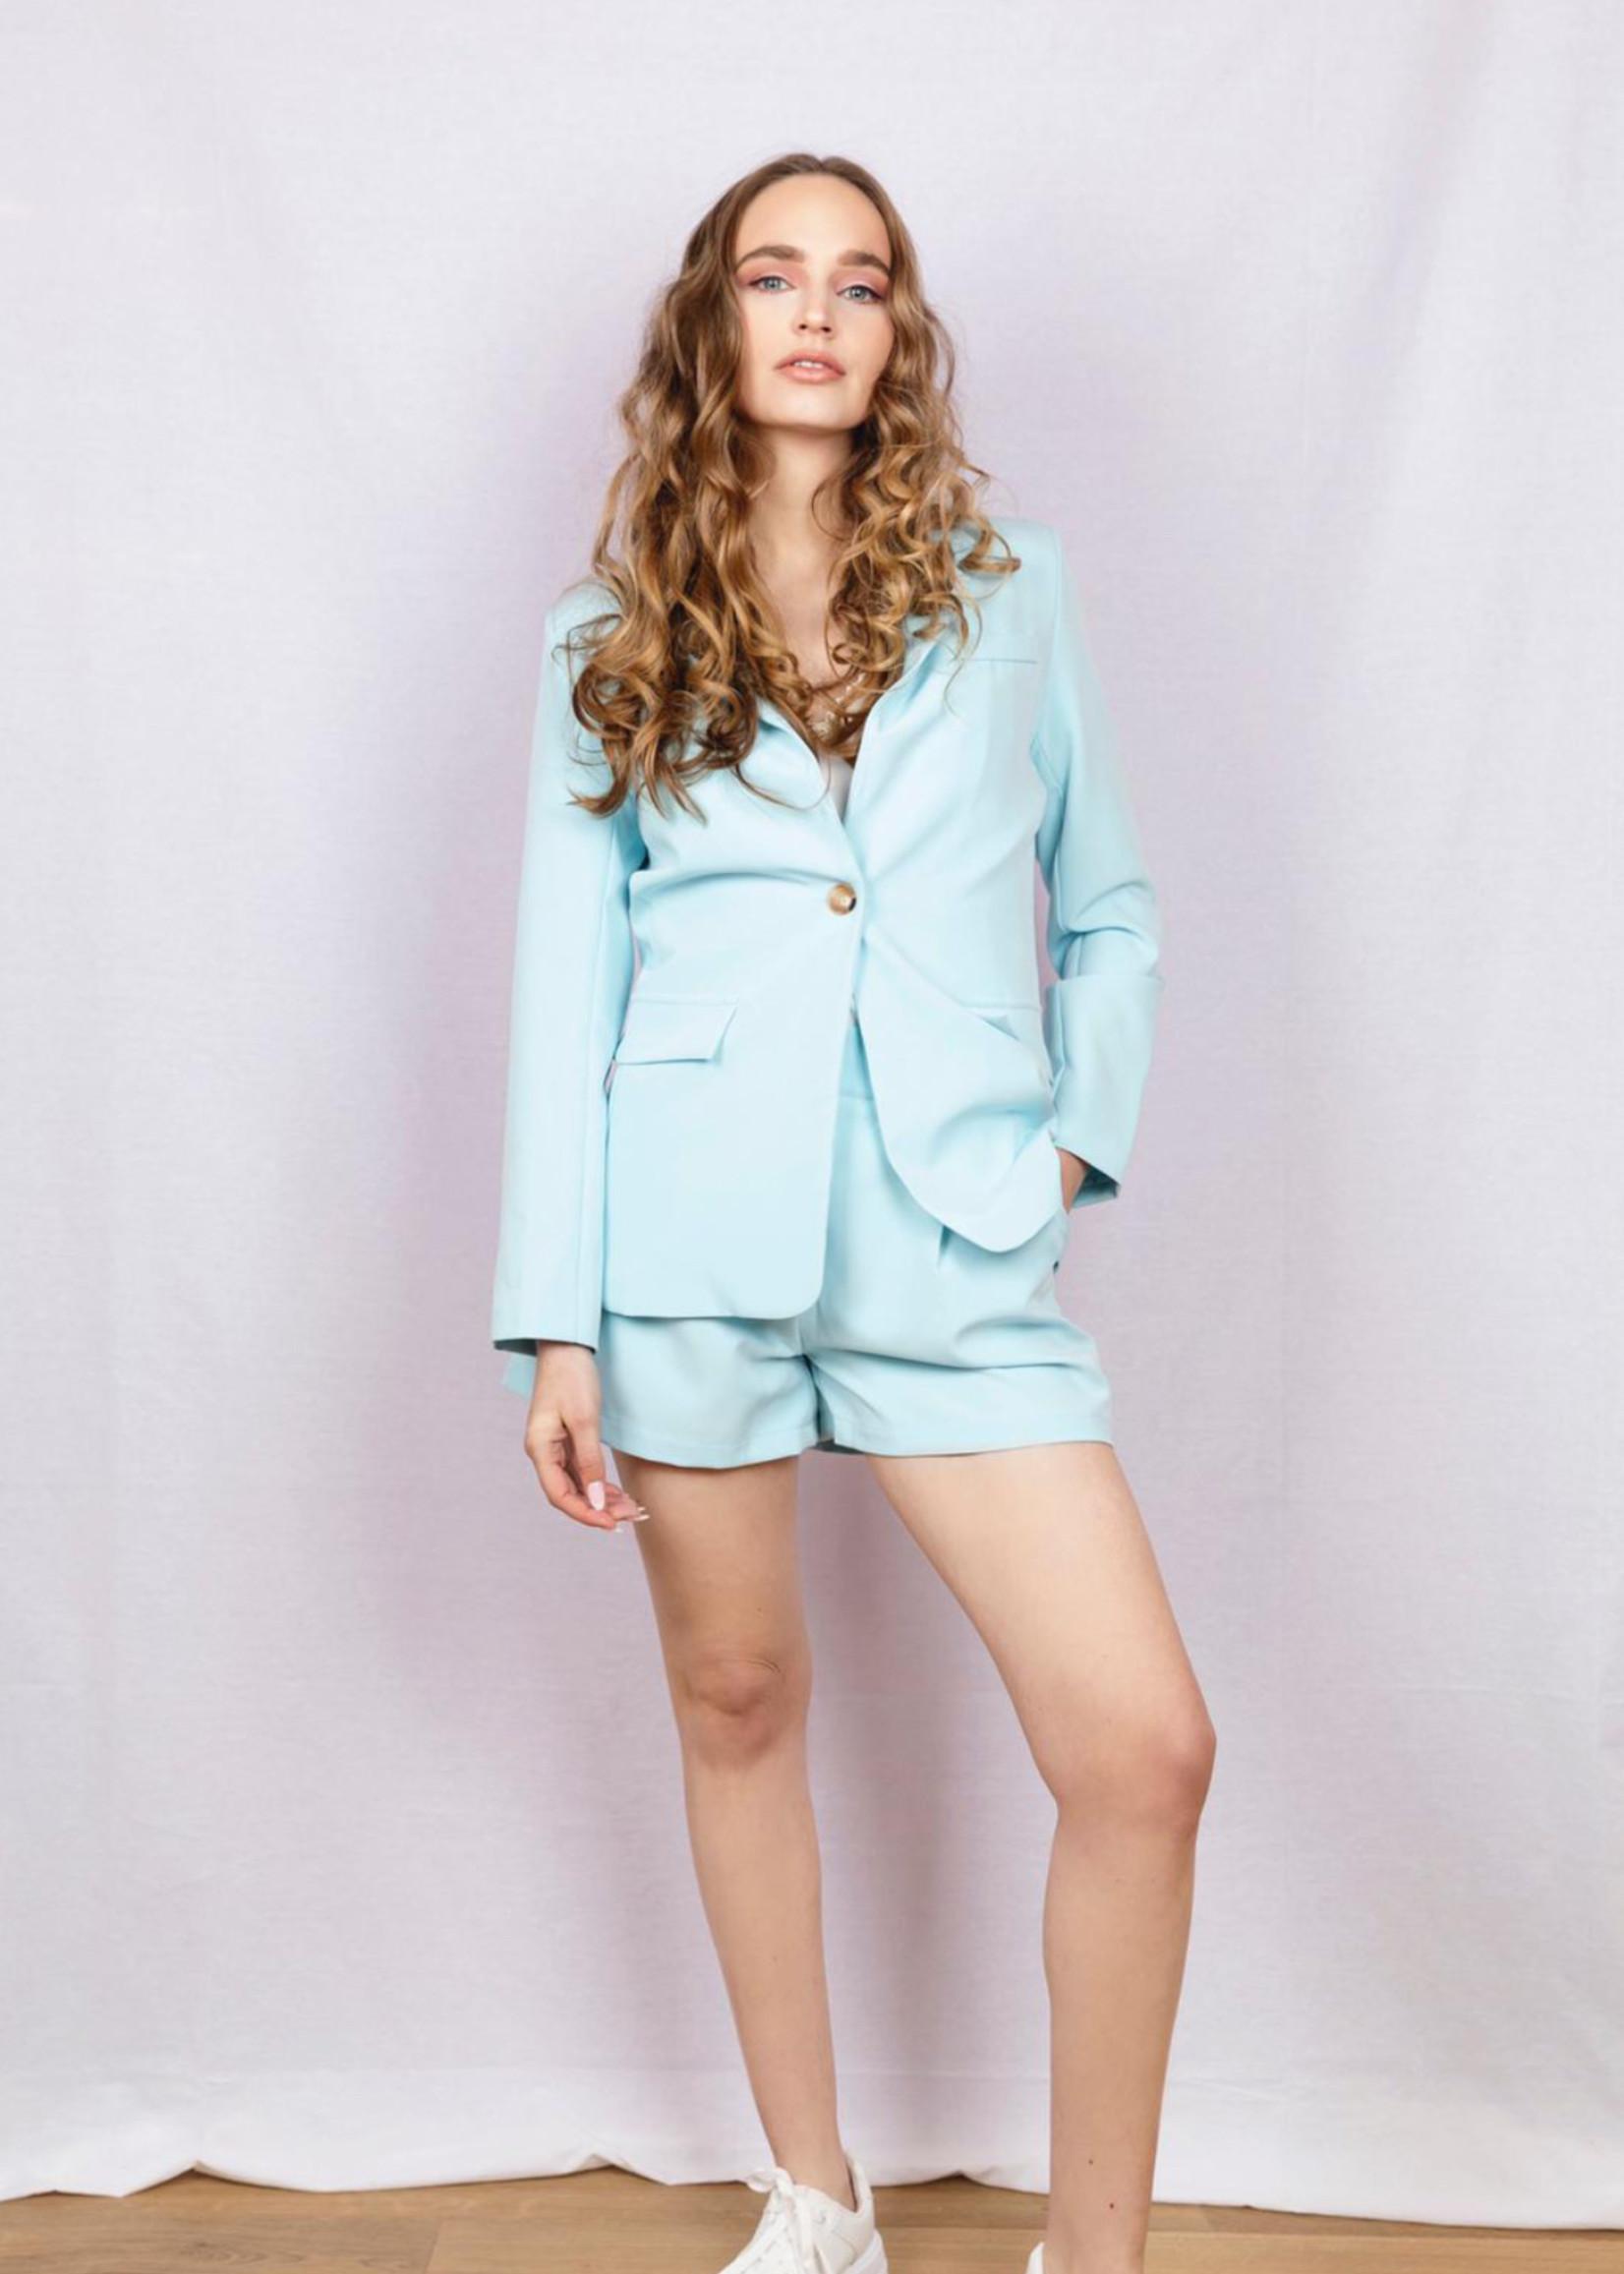 Kostuumjasje felblauw